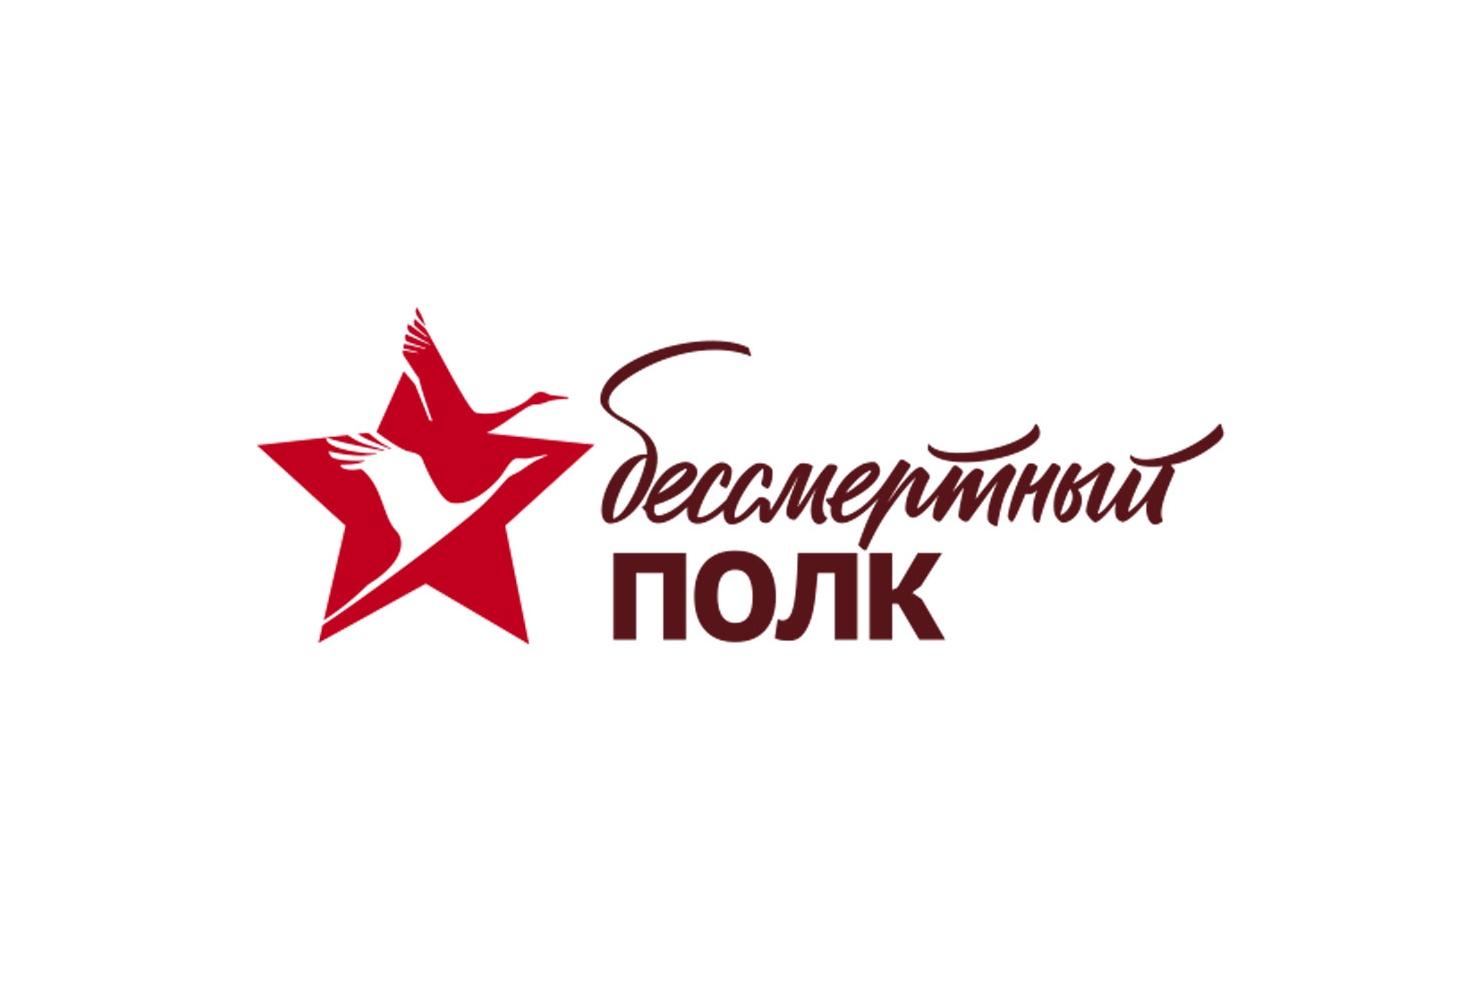 lutov-vasilij-ivanovich